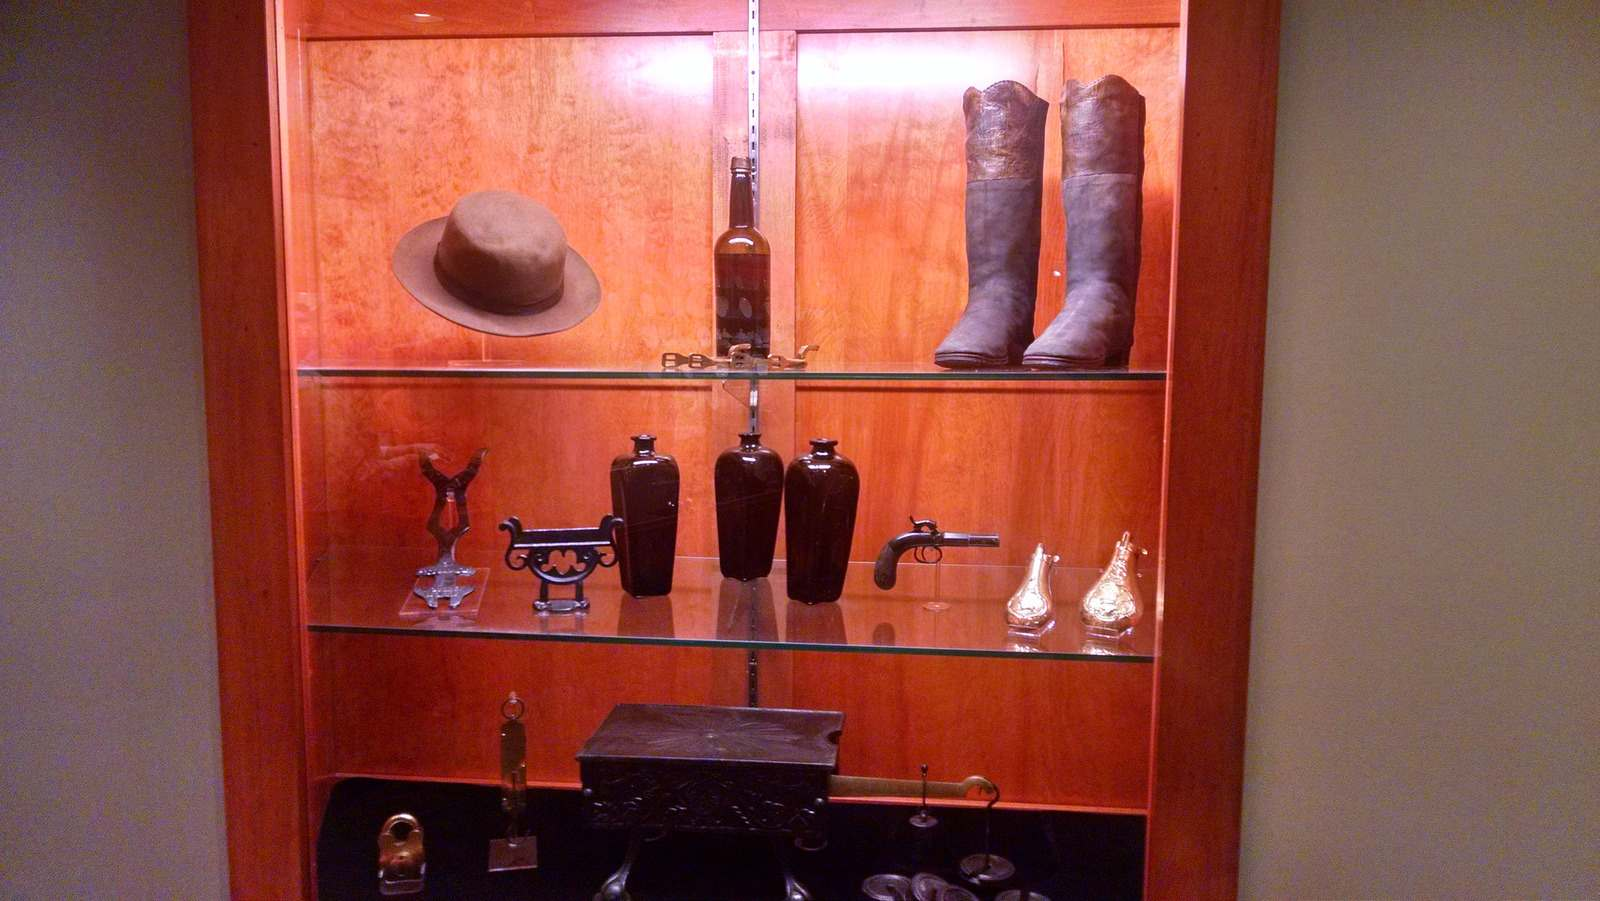 steamboat arabia11 History of Pioneering Midwest   Steamboat Arabia Museum in Kansas City